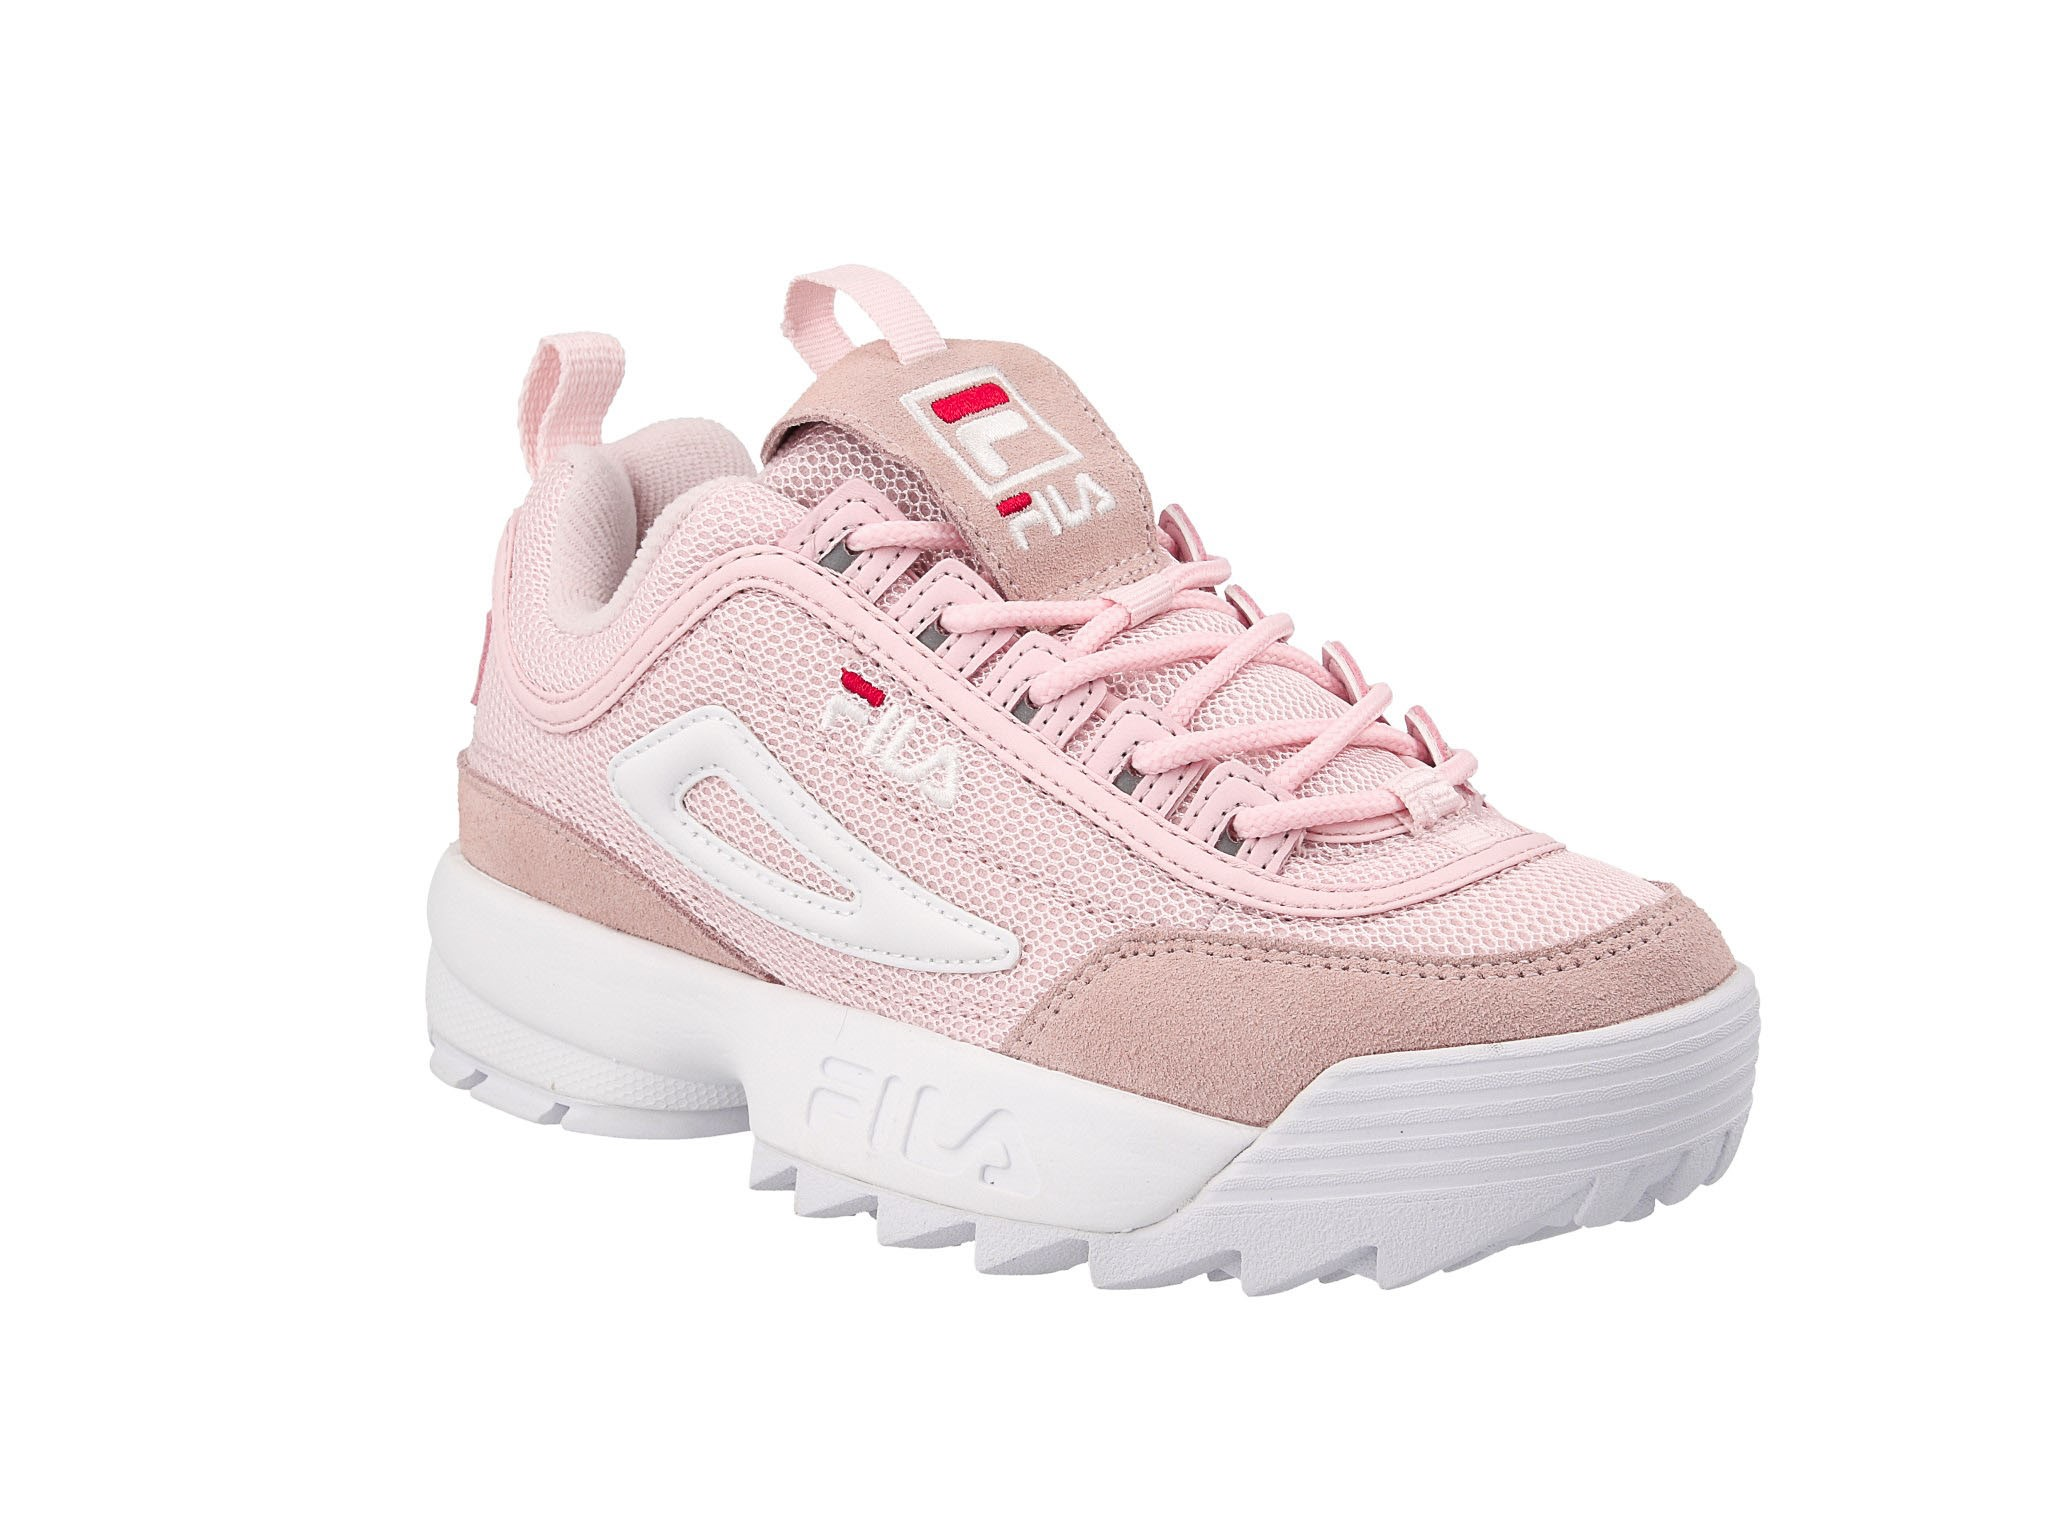 Sneakersy FILA Disruptor Mesh Low Wmn 1010606.71D Chalk Pink Buty sportowe damskie różowe w eobuwie.pl